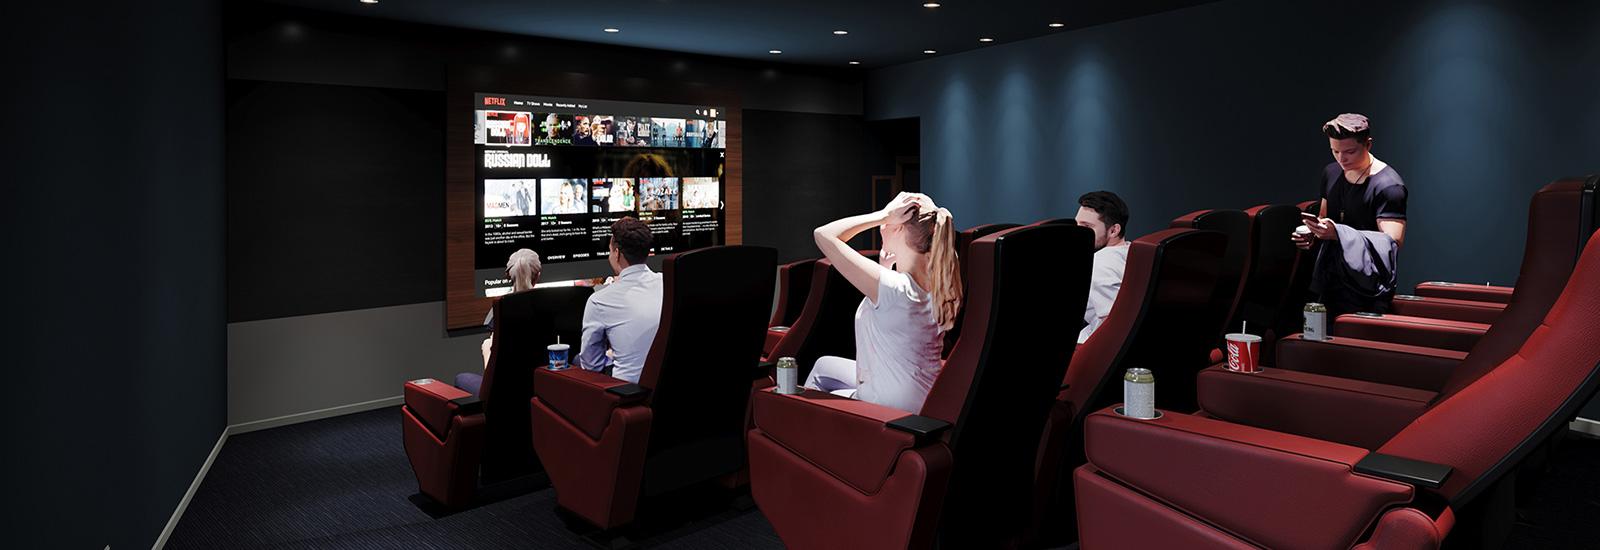 Residents Enjoying The Movie Theater Amenity